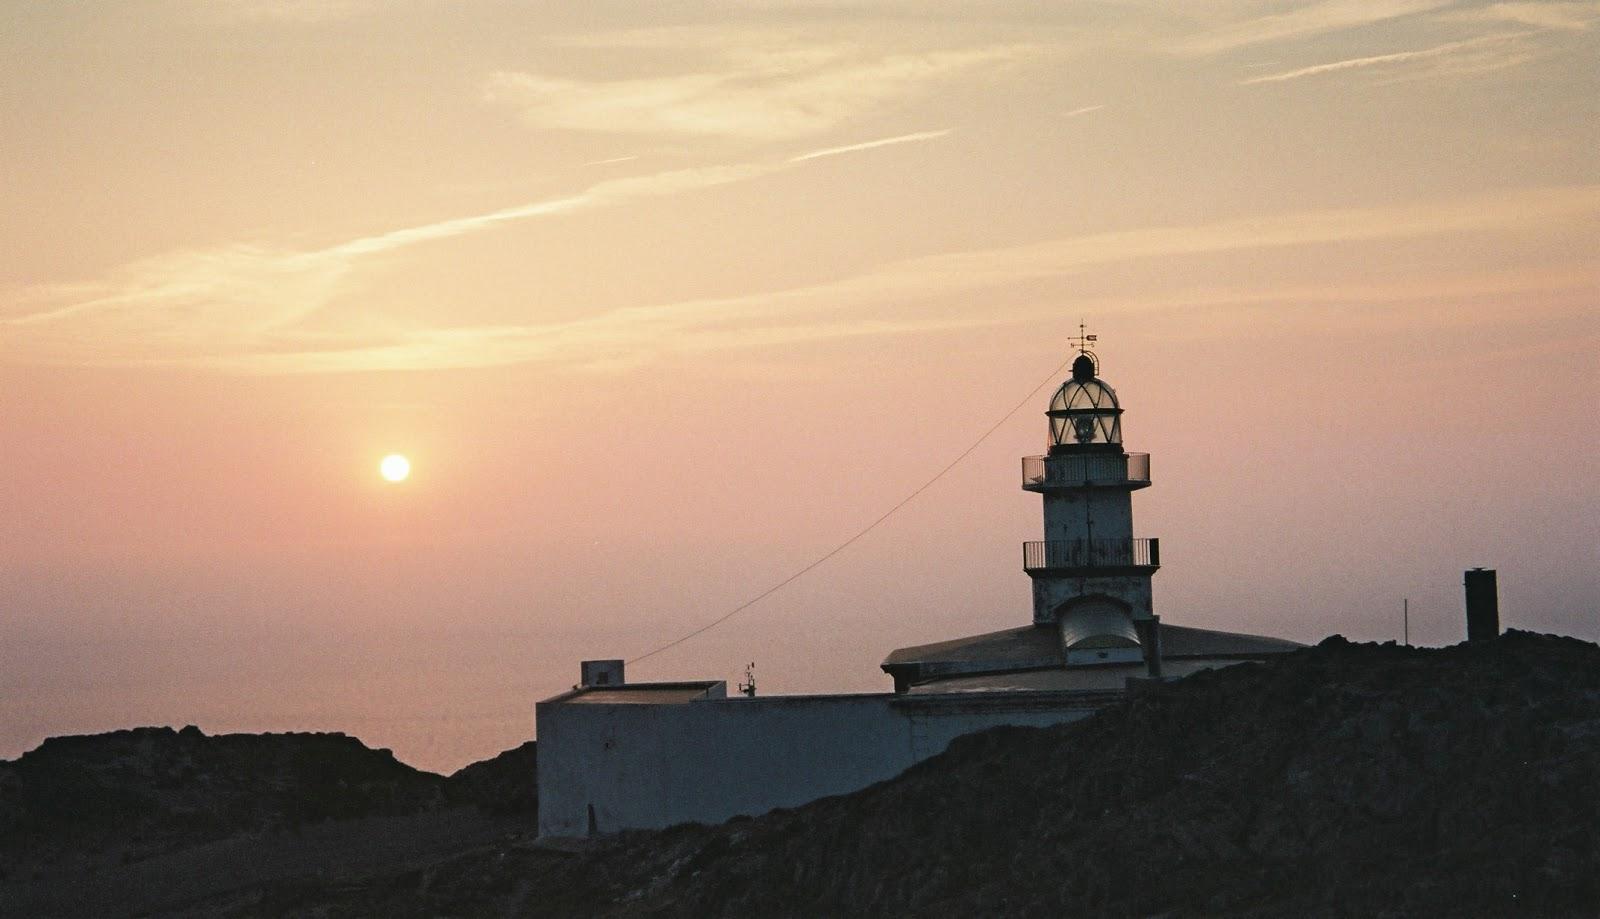 El faro de cap de Creus a pocos kms de Cadaqués